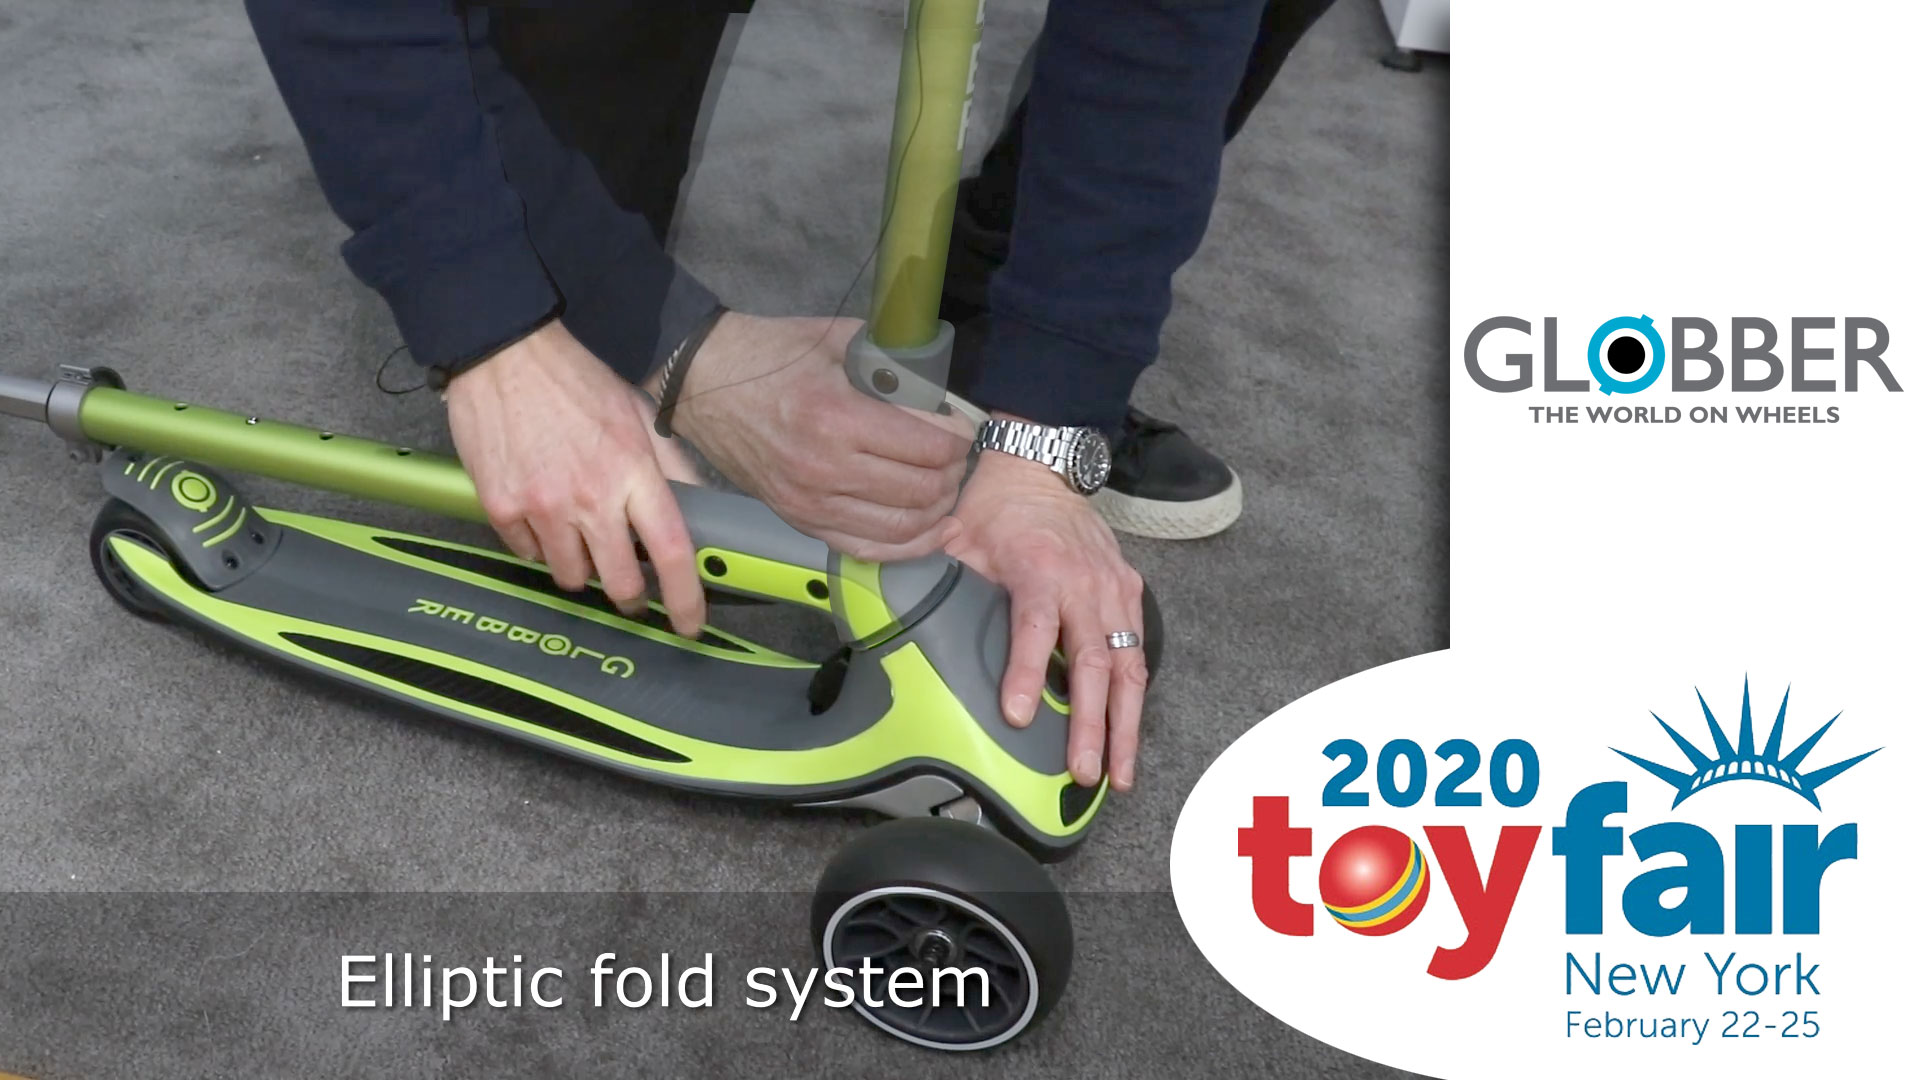 Globber Scooter @ ToyFair 2020